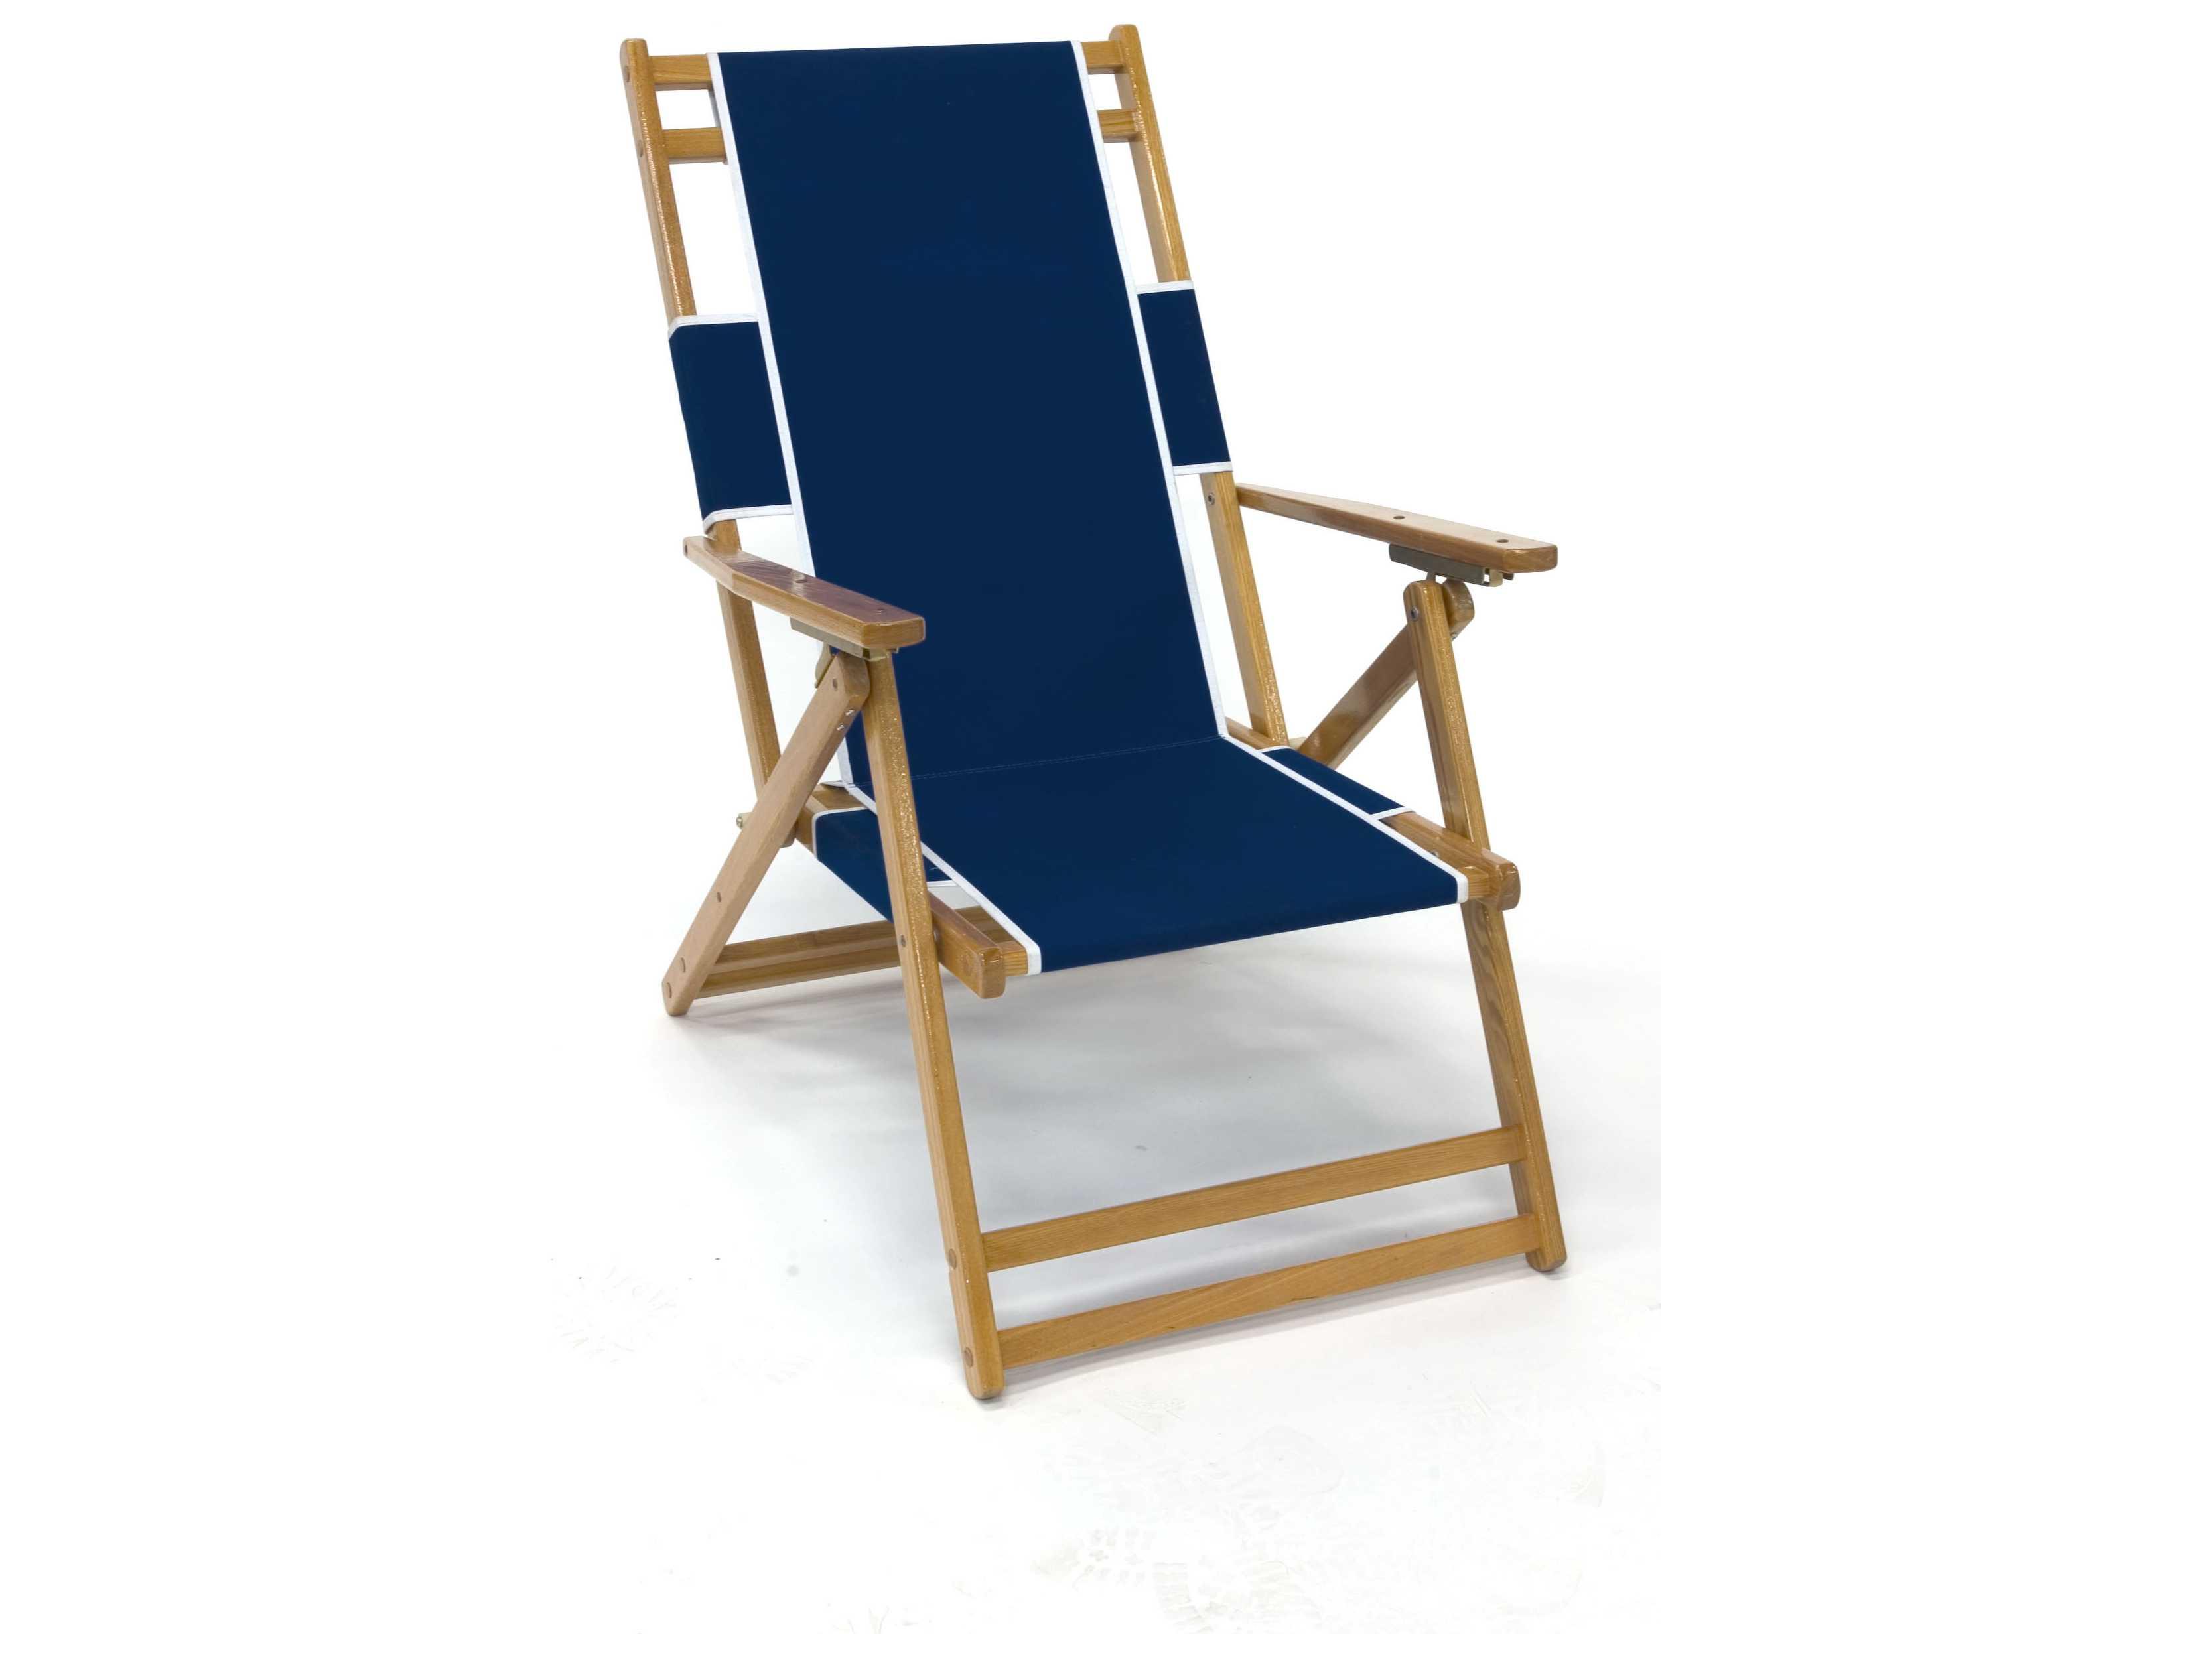 lounge chair umbrella stand best bathtub for elderly frankford umbrellas oak wood beach no foot rest